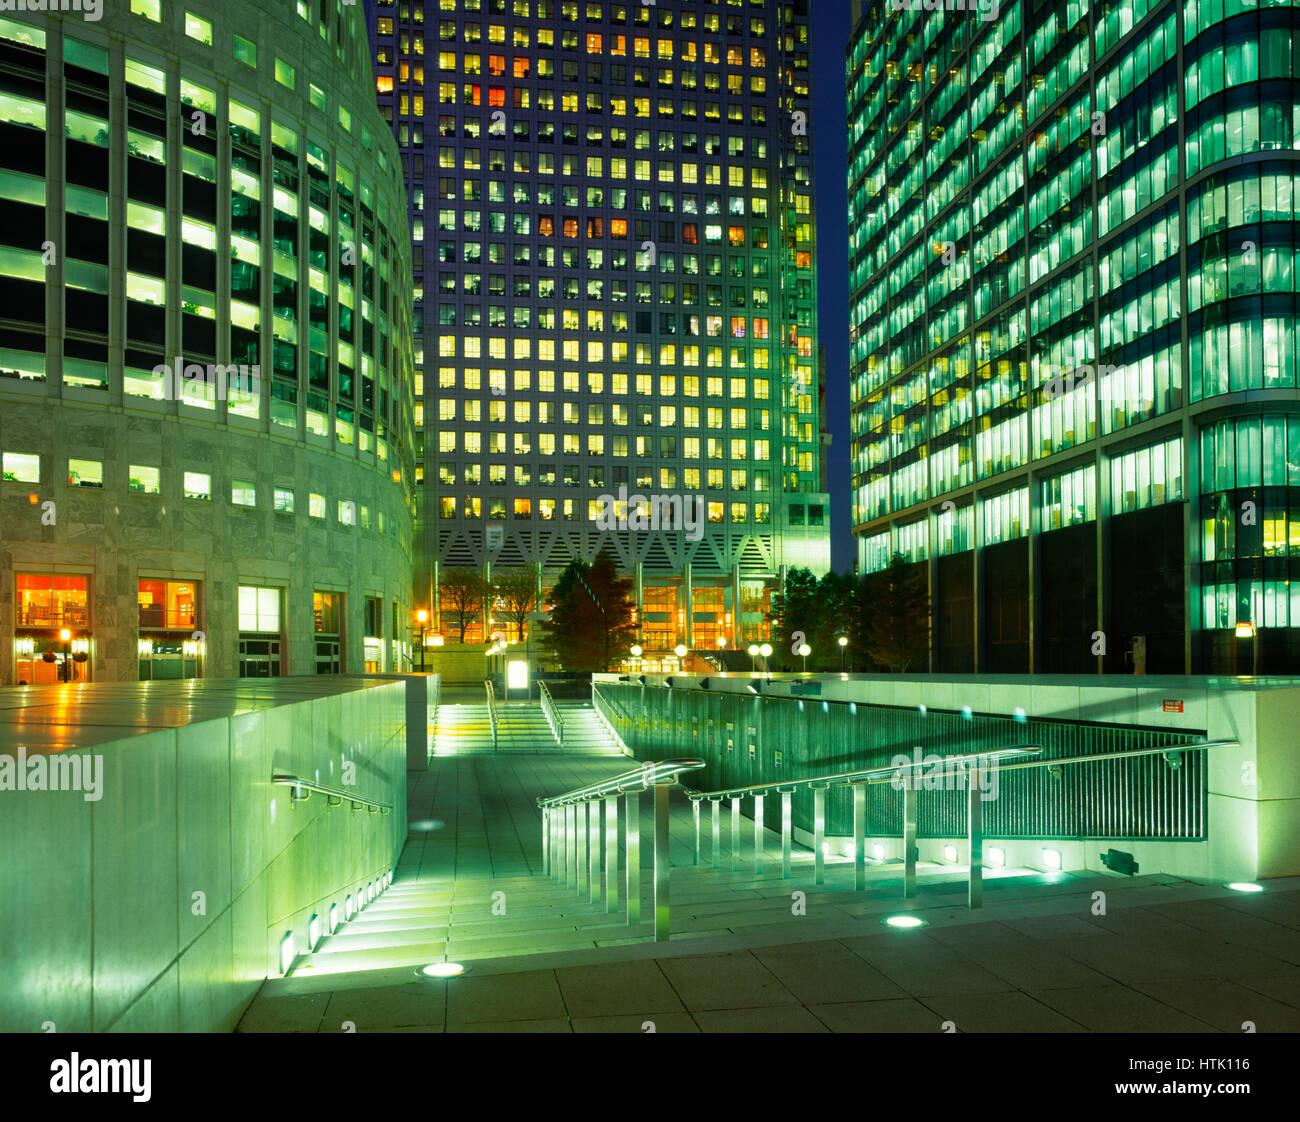 Canary Wharf Financial Centre, Docklands, London,England, UK - Stock Image